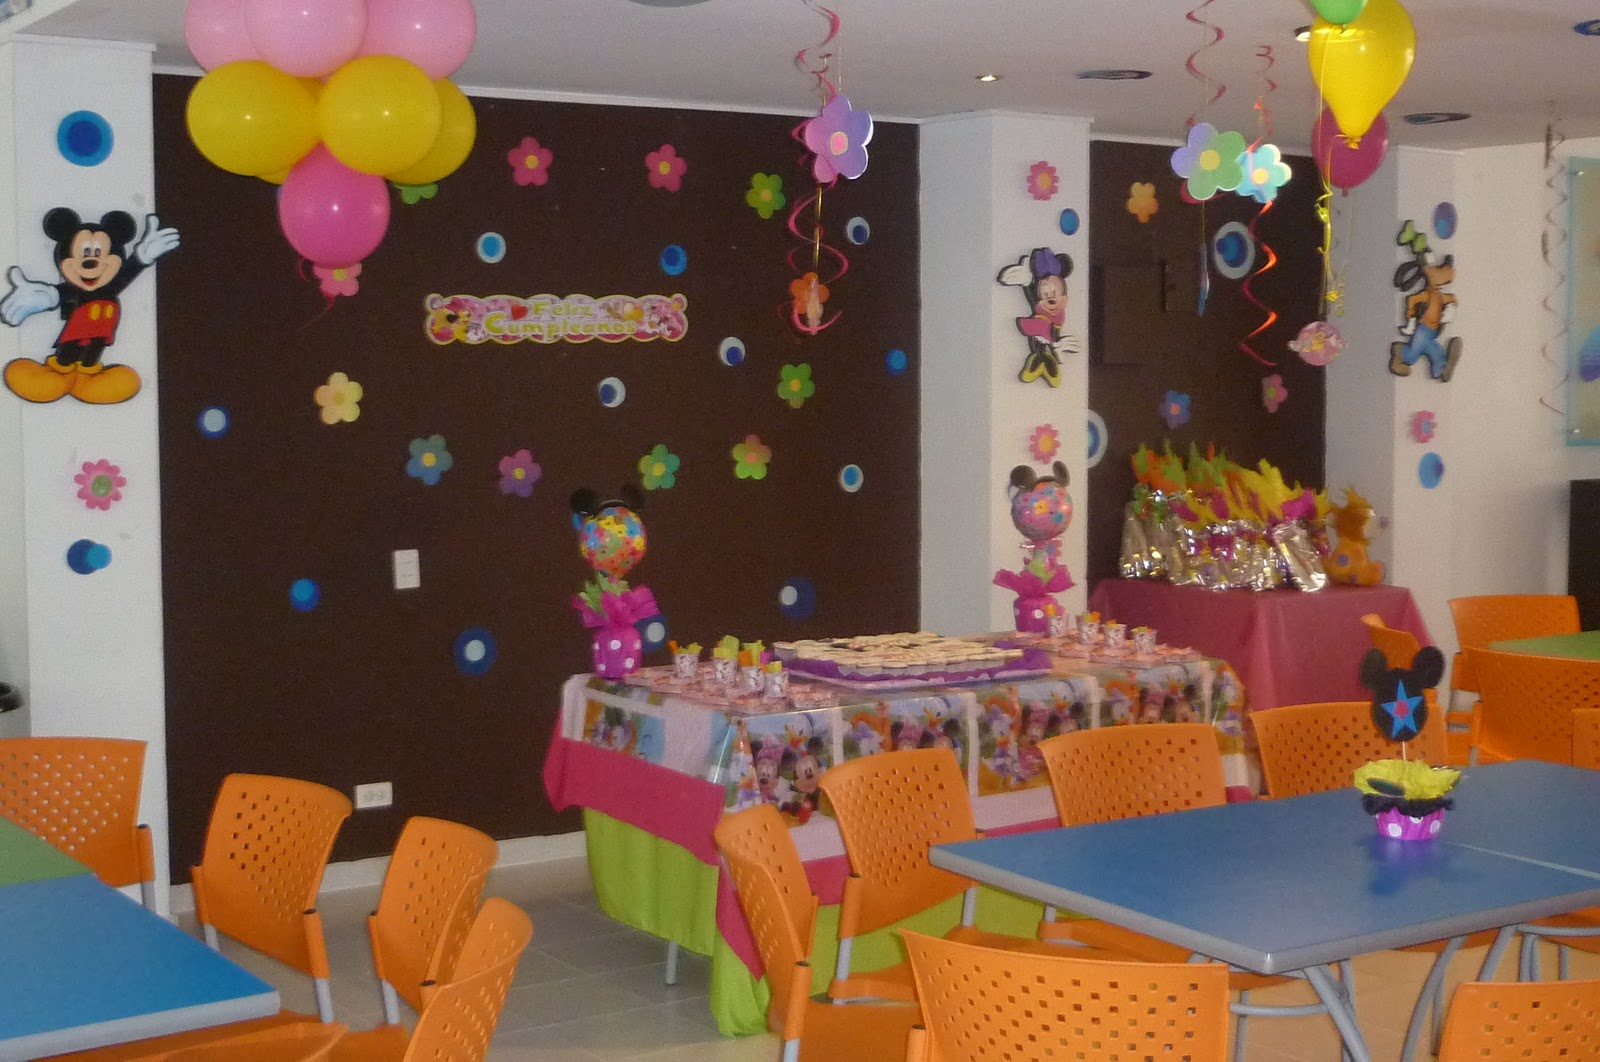 Como hacer centros de mesa con globos para fiestas for Decoracion de fiestas para adultos